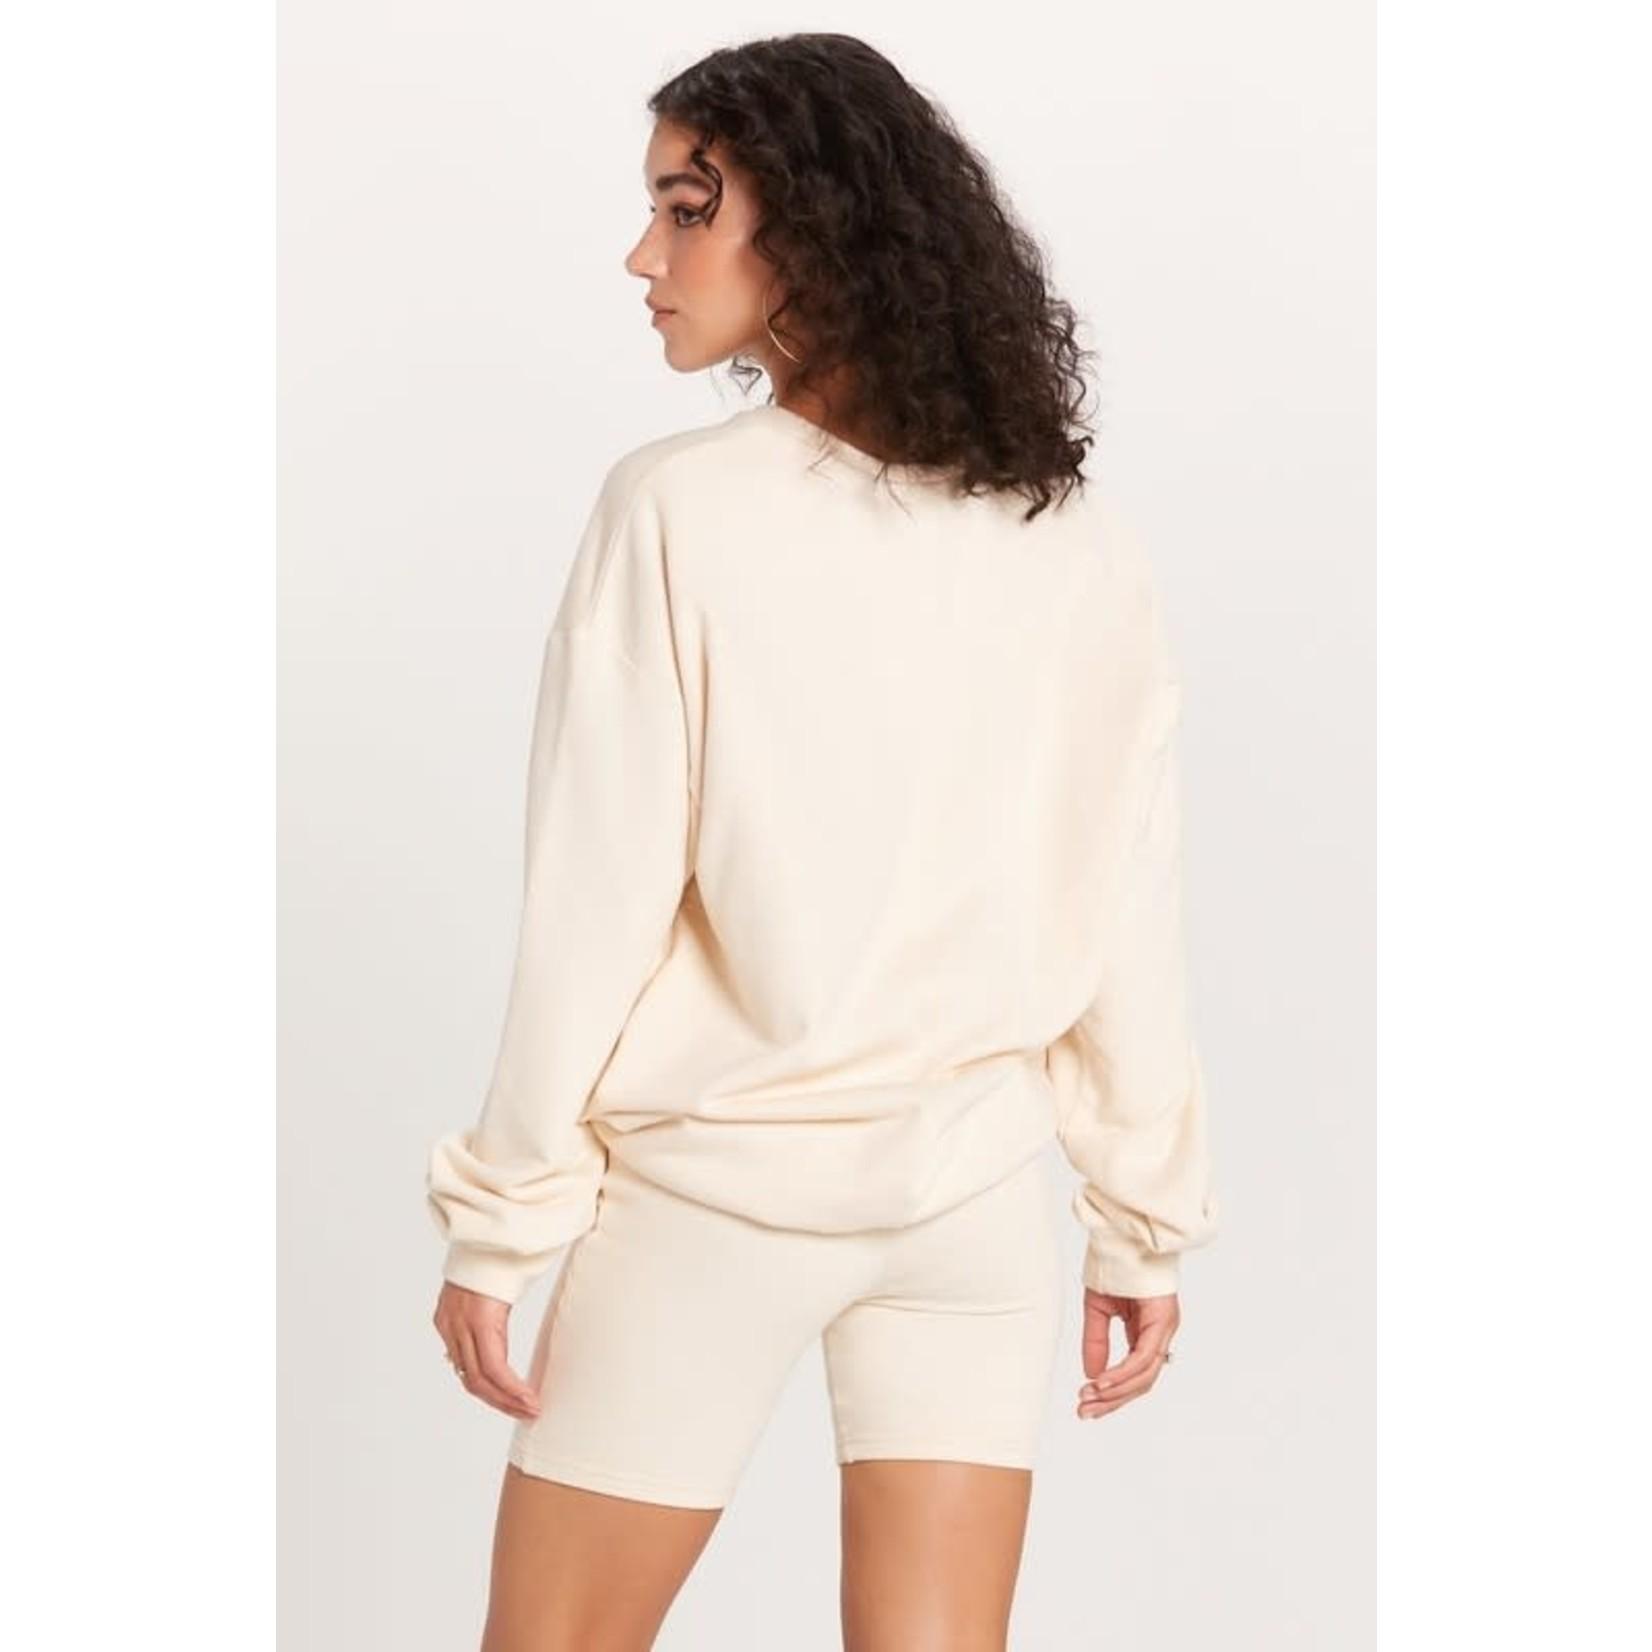 EM & ELLE Calypso  Oversized Sweatshirt